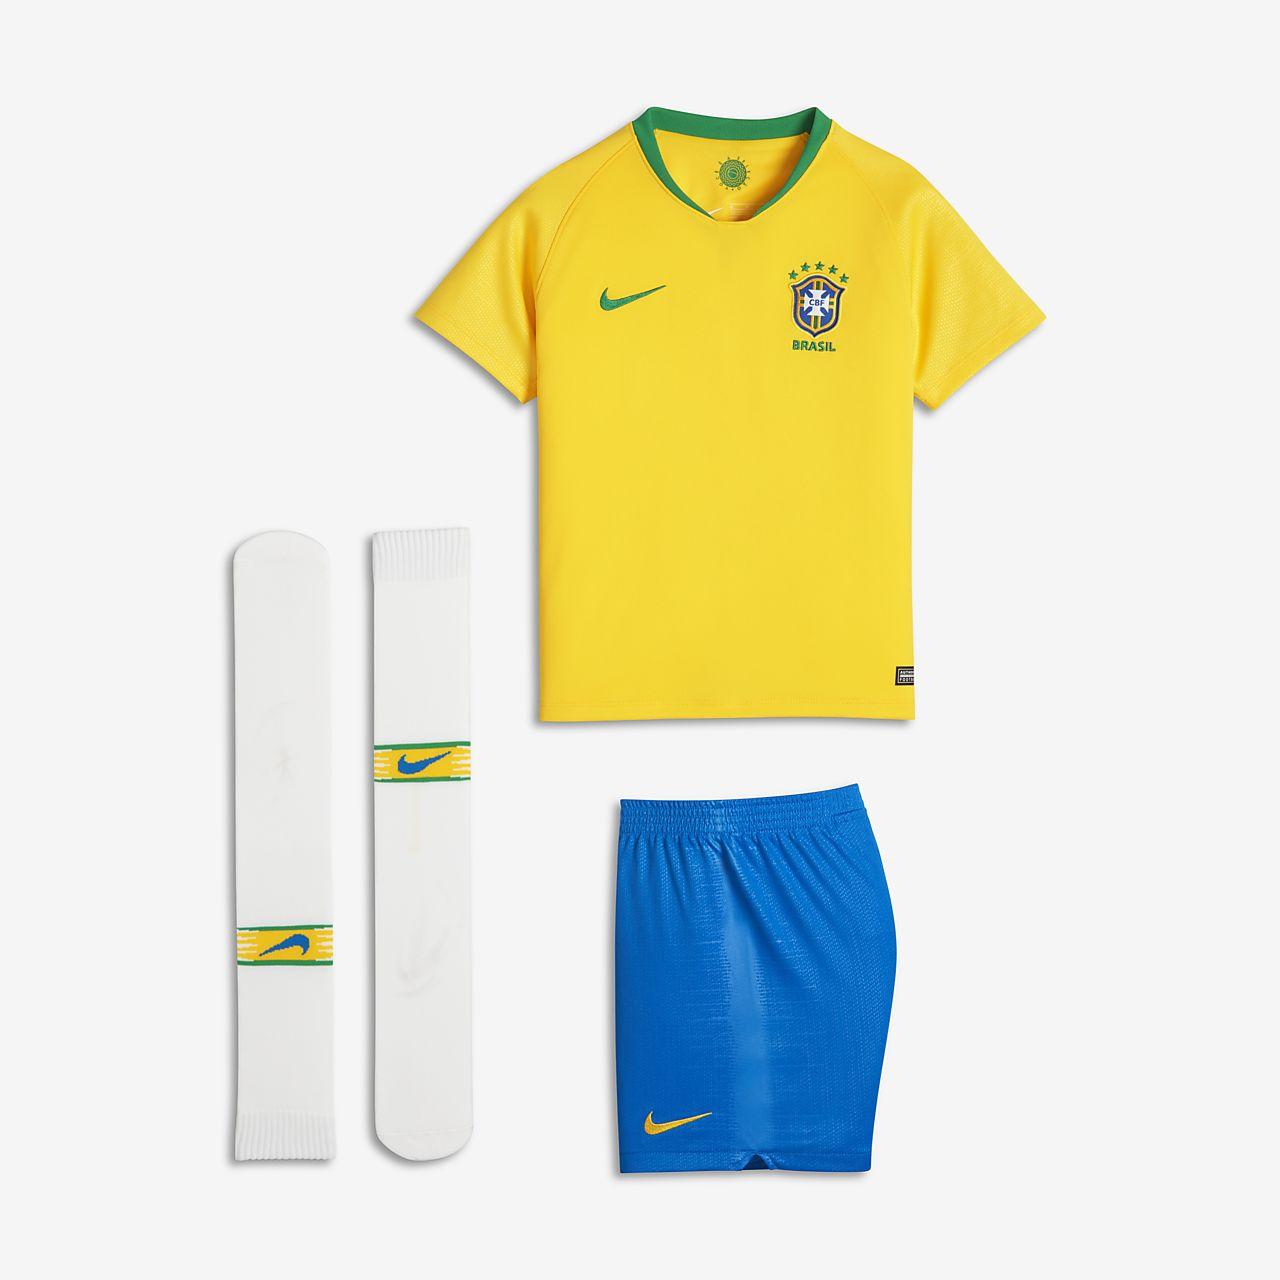 Tenue de football 2018 Brasil CBF Stadium Home pour Jeune enfant